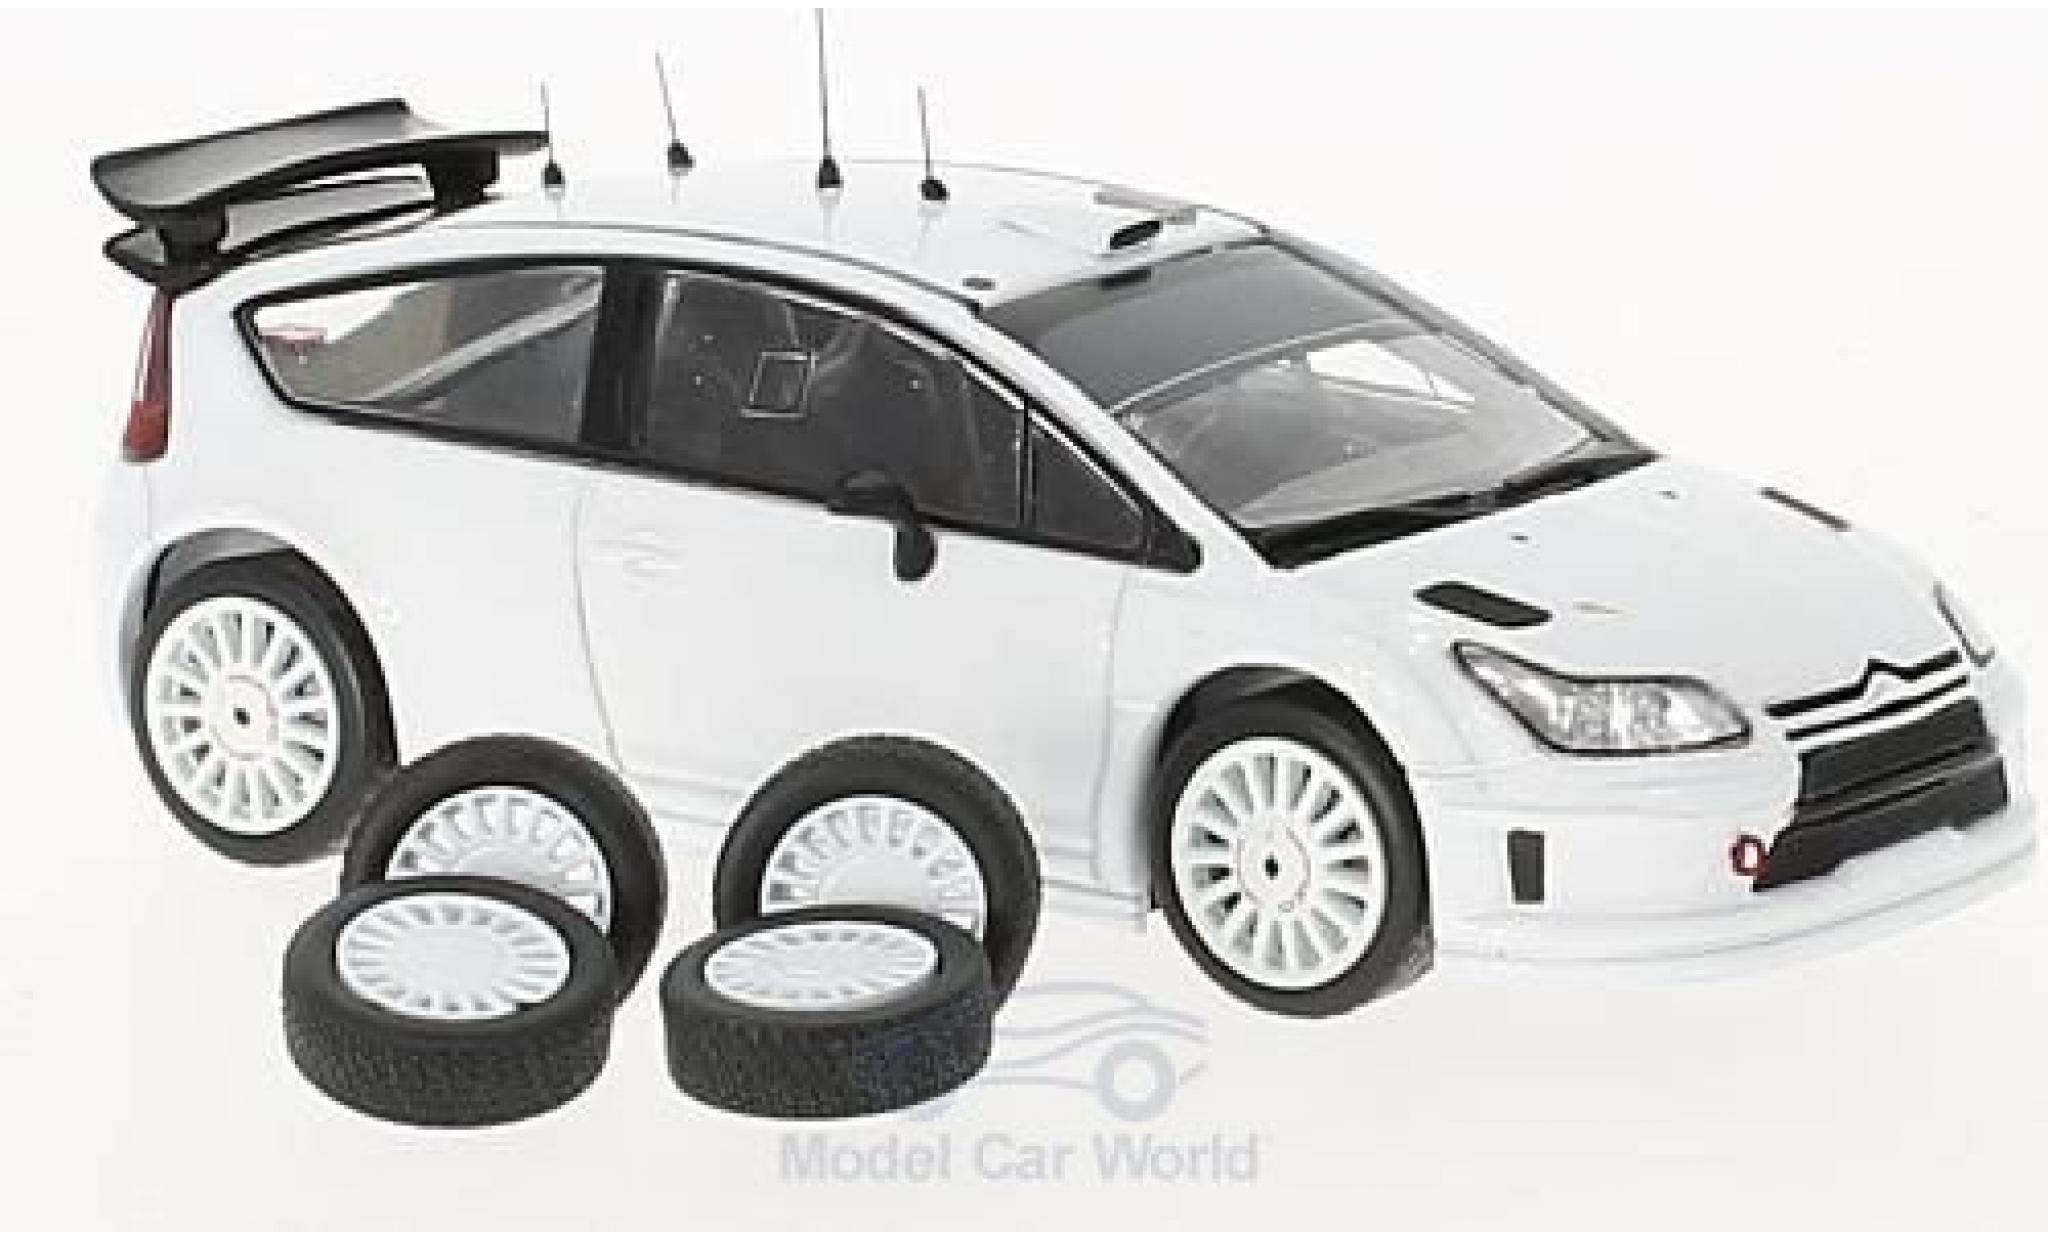 Citroen C4 WRC 1/43 IXO WRC blanche 2010 Plain Body Version inklusive 4 Ersatzräder